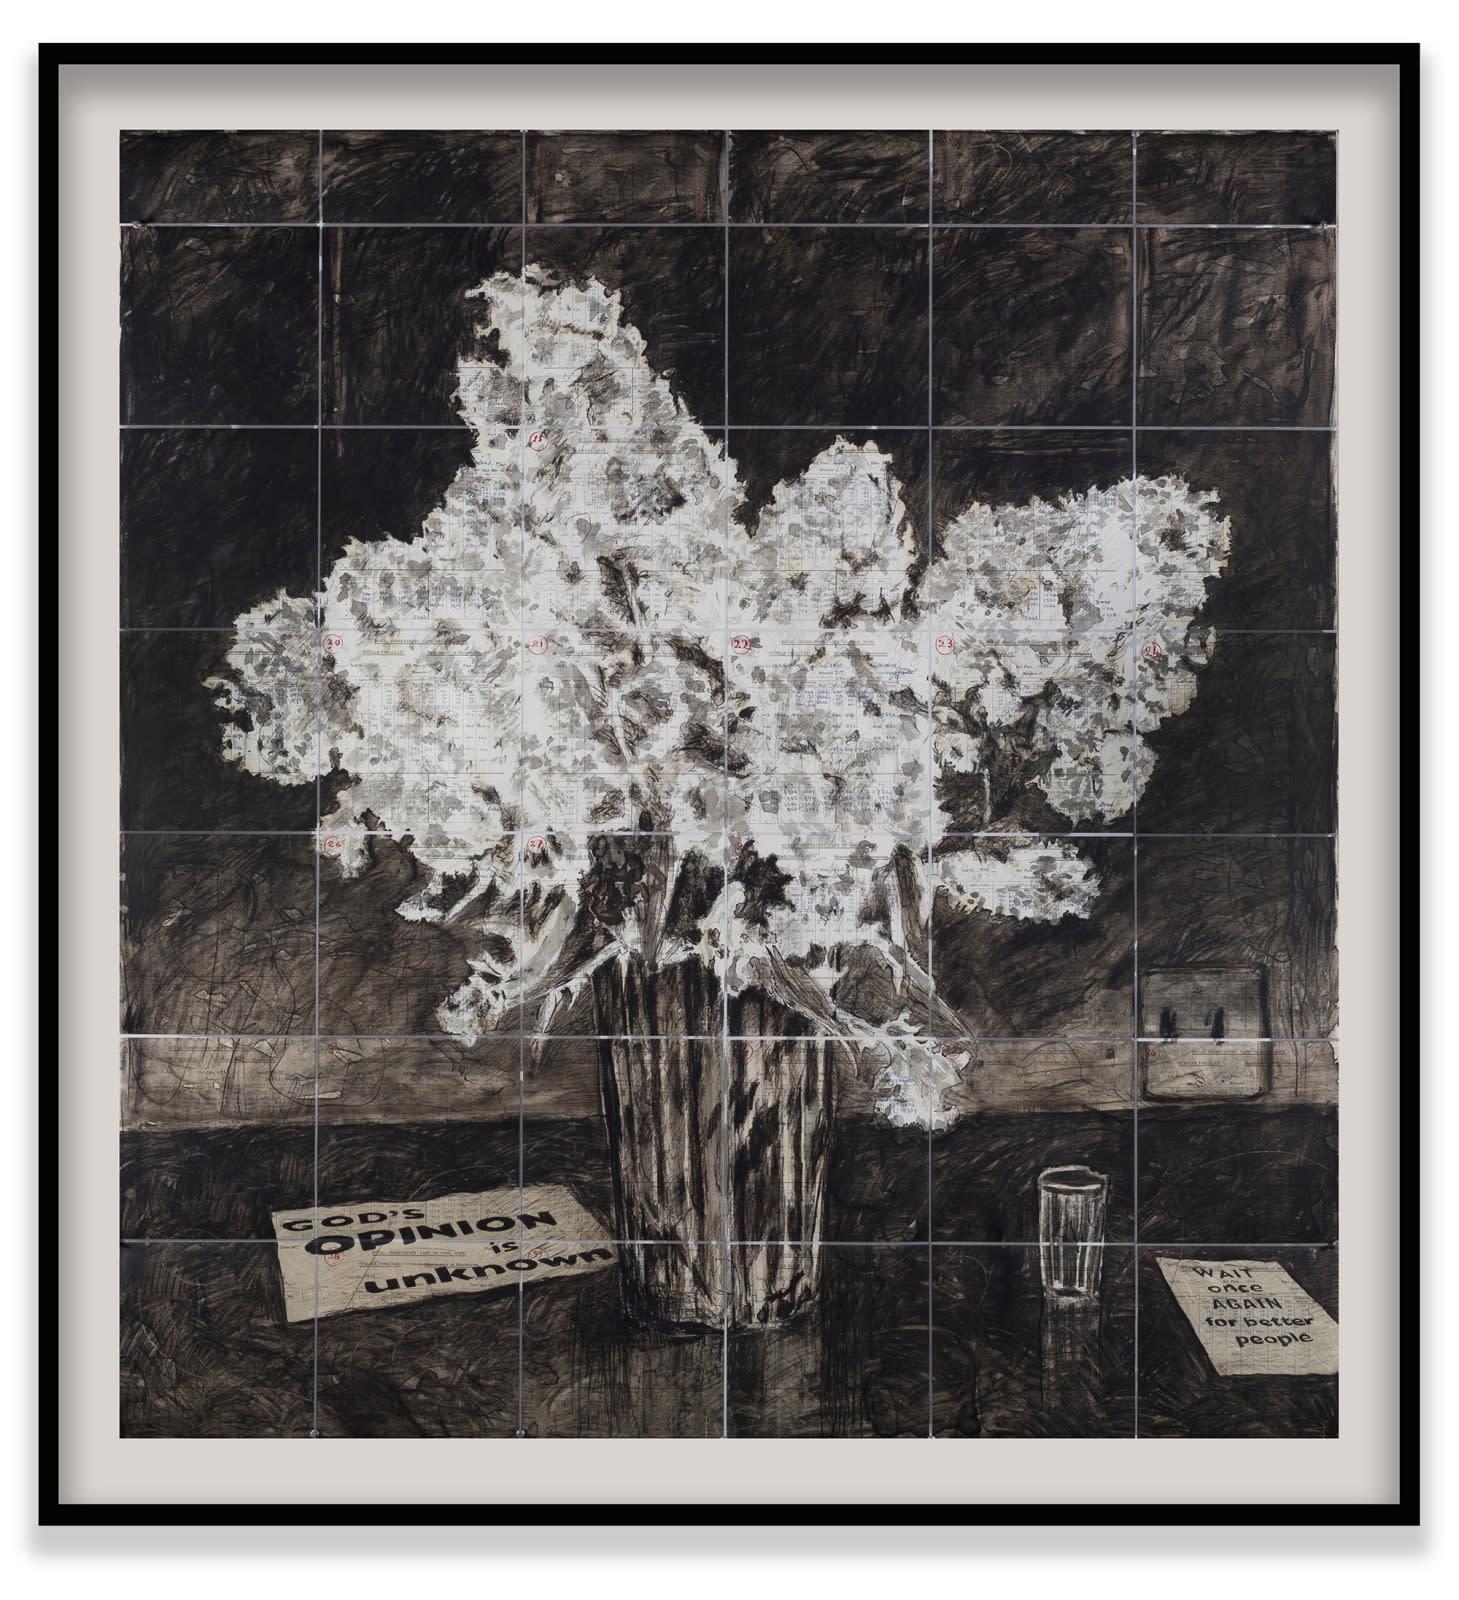 Hyacinths by William Kentridge